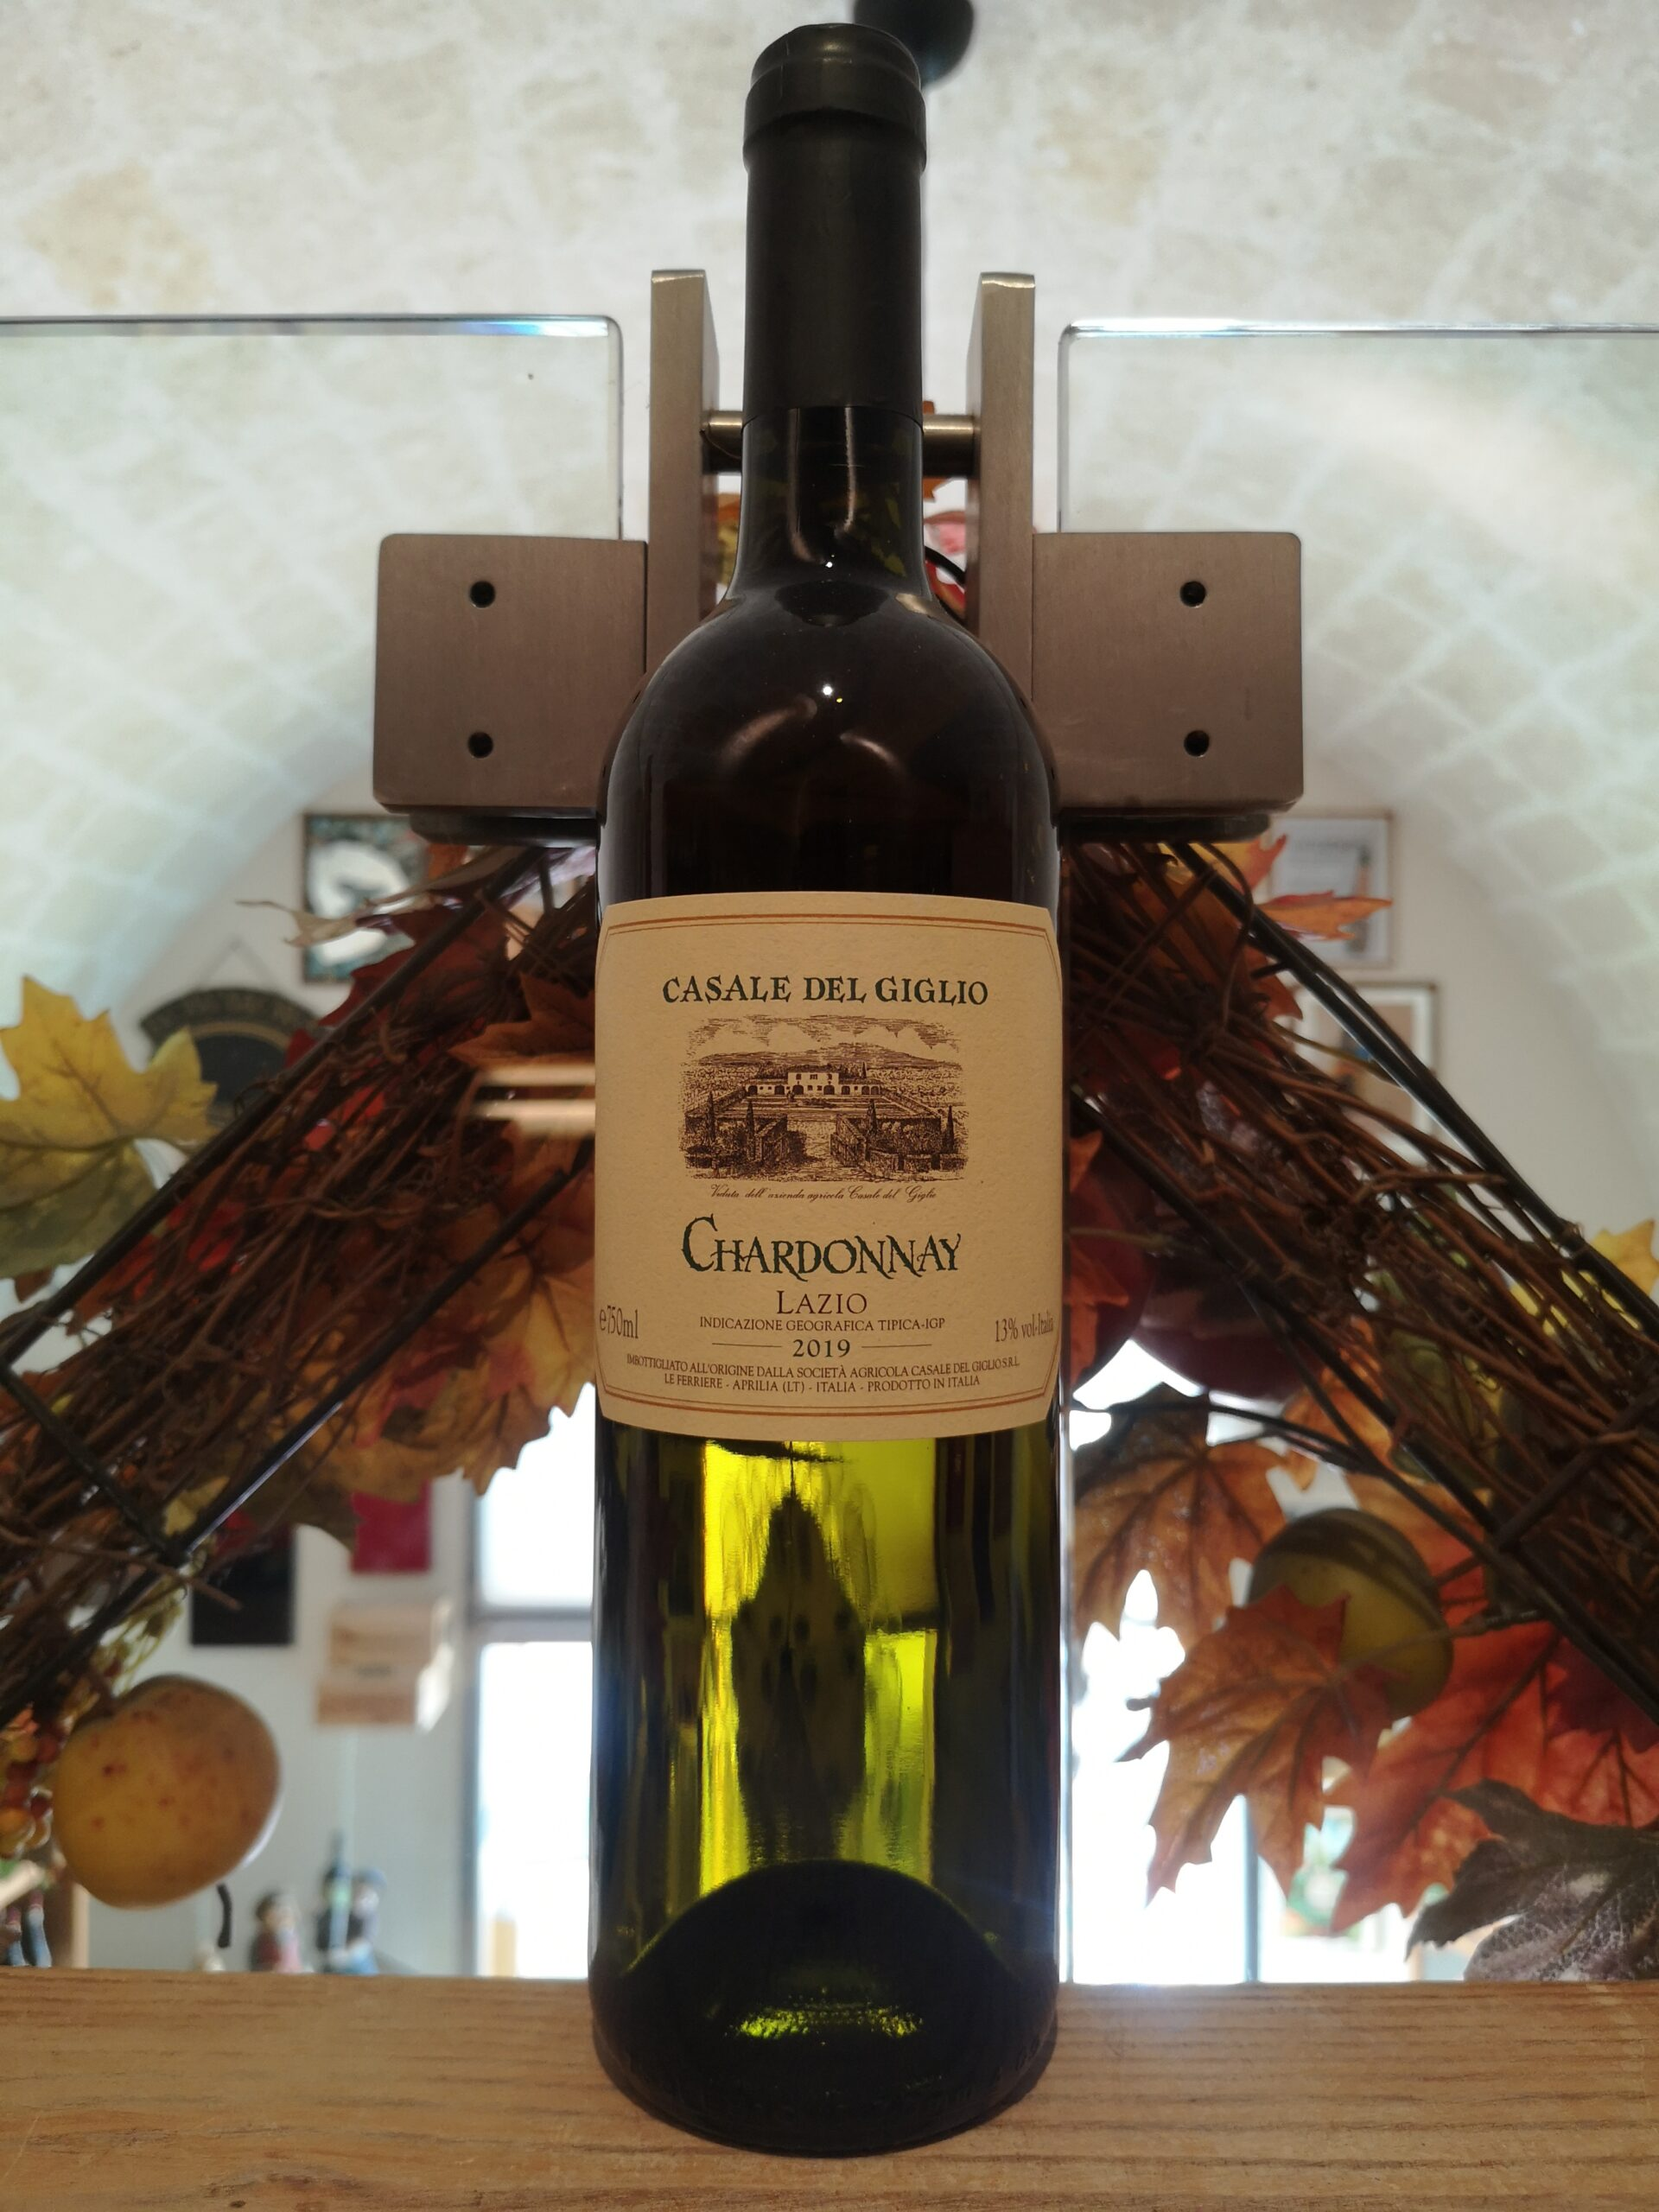 Chardonnay Casale Del Giglio Bianco Lazio IGT 2019